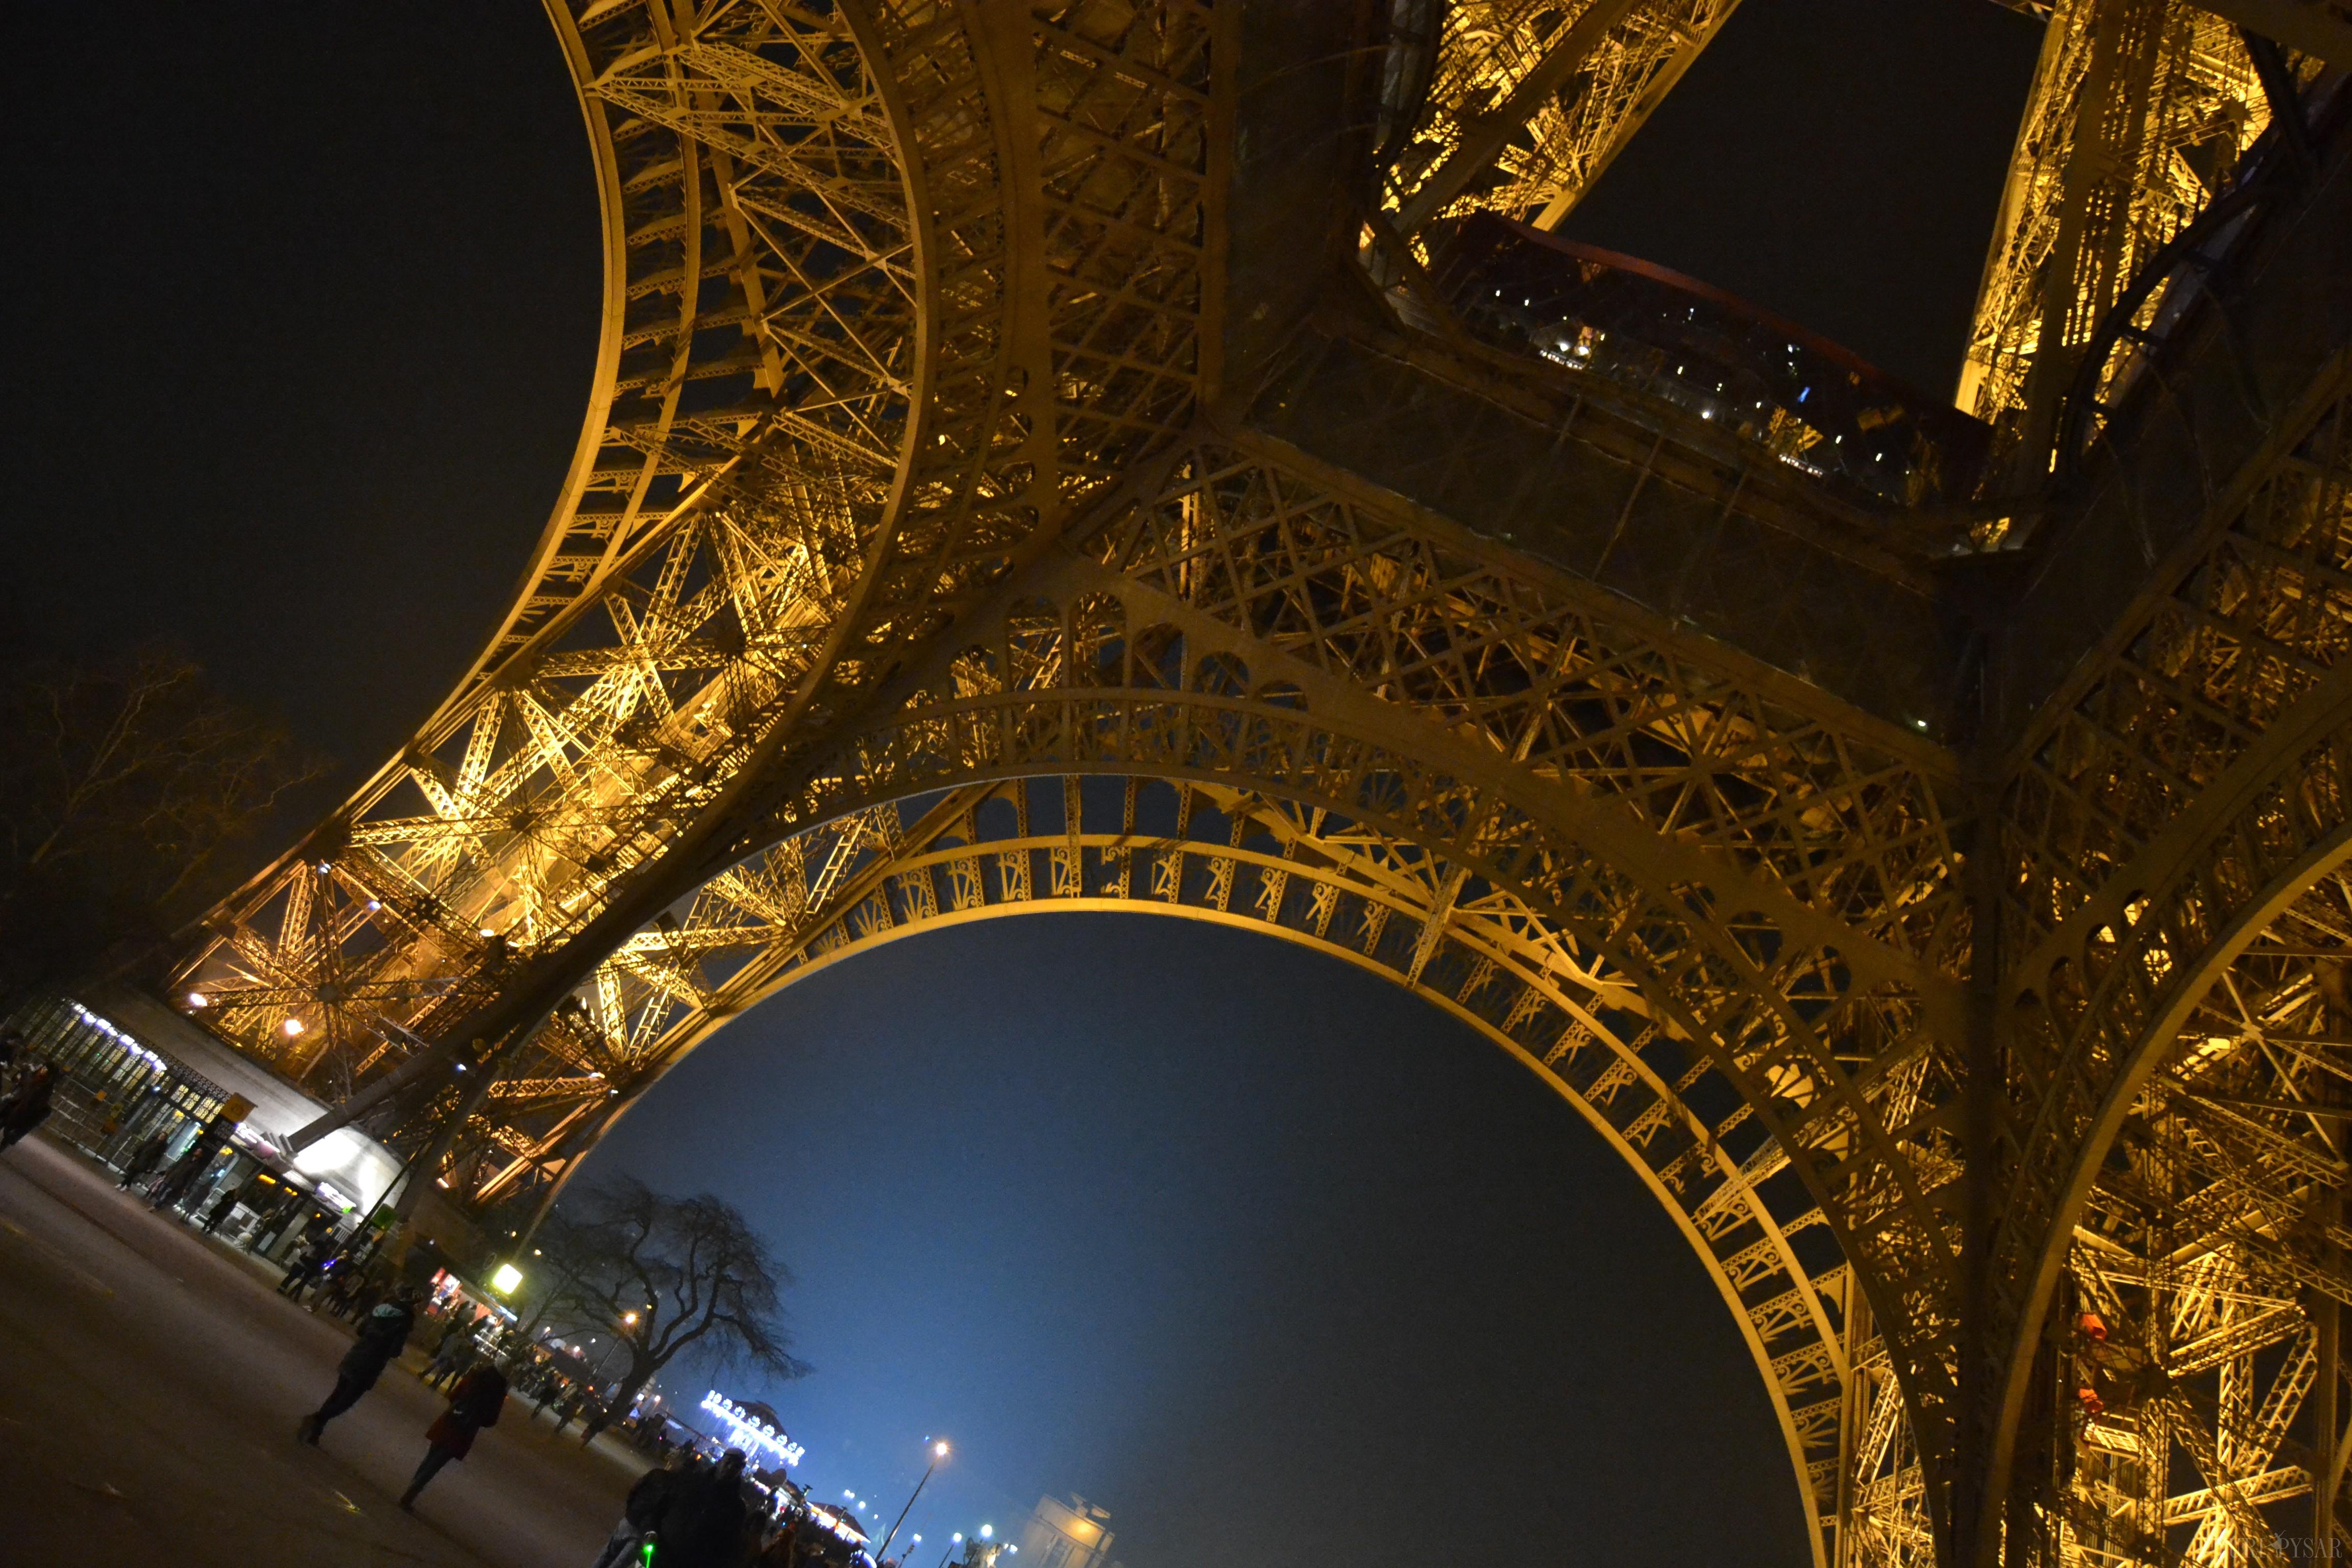 eifel tower base in Paris by night lights